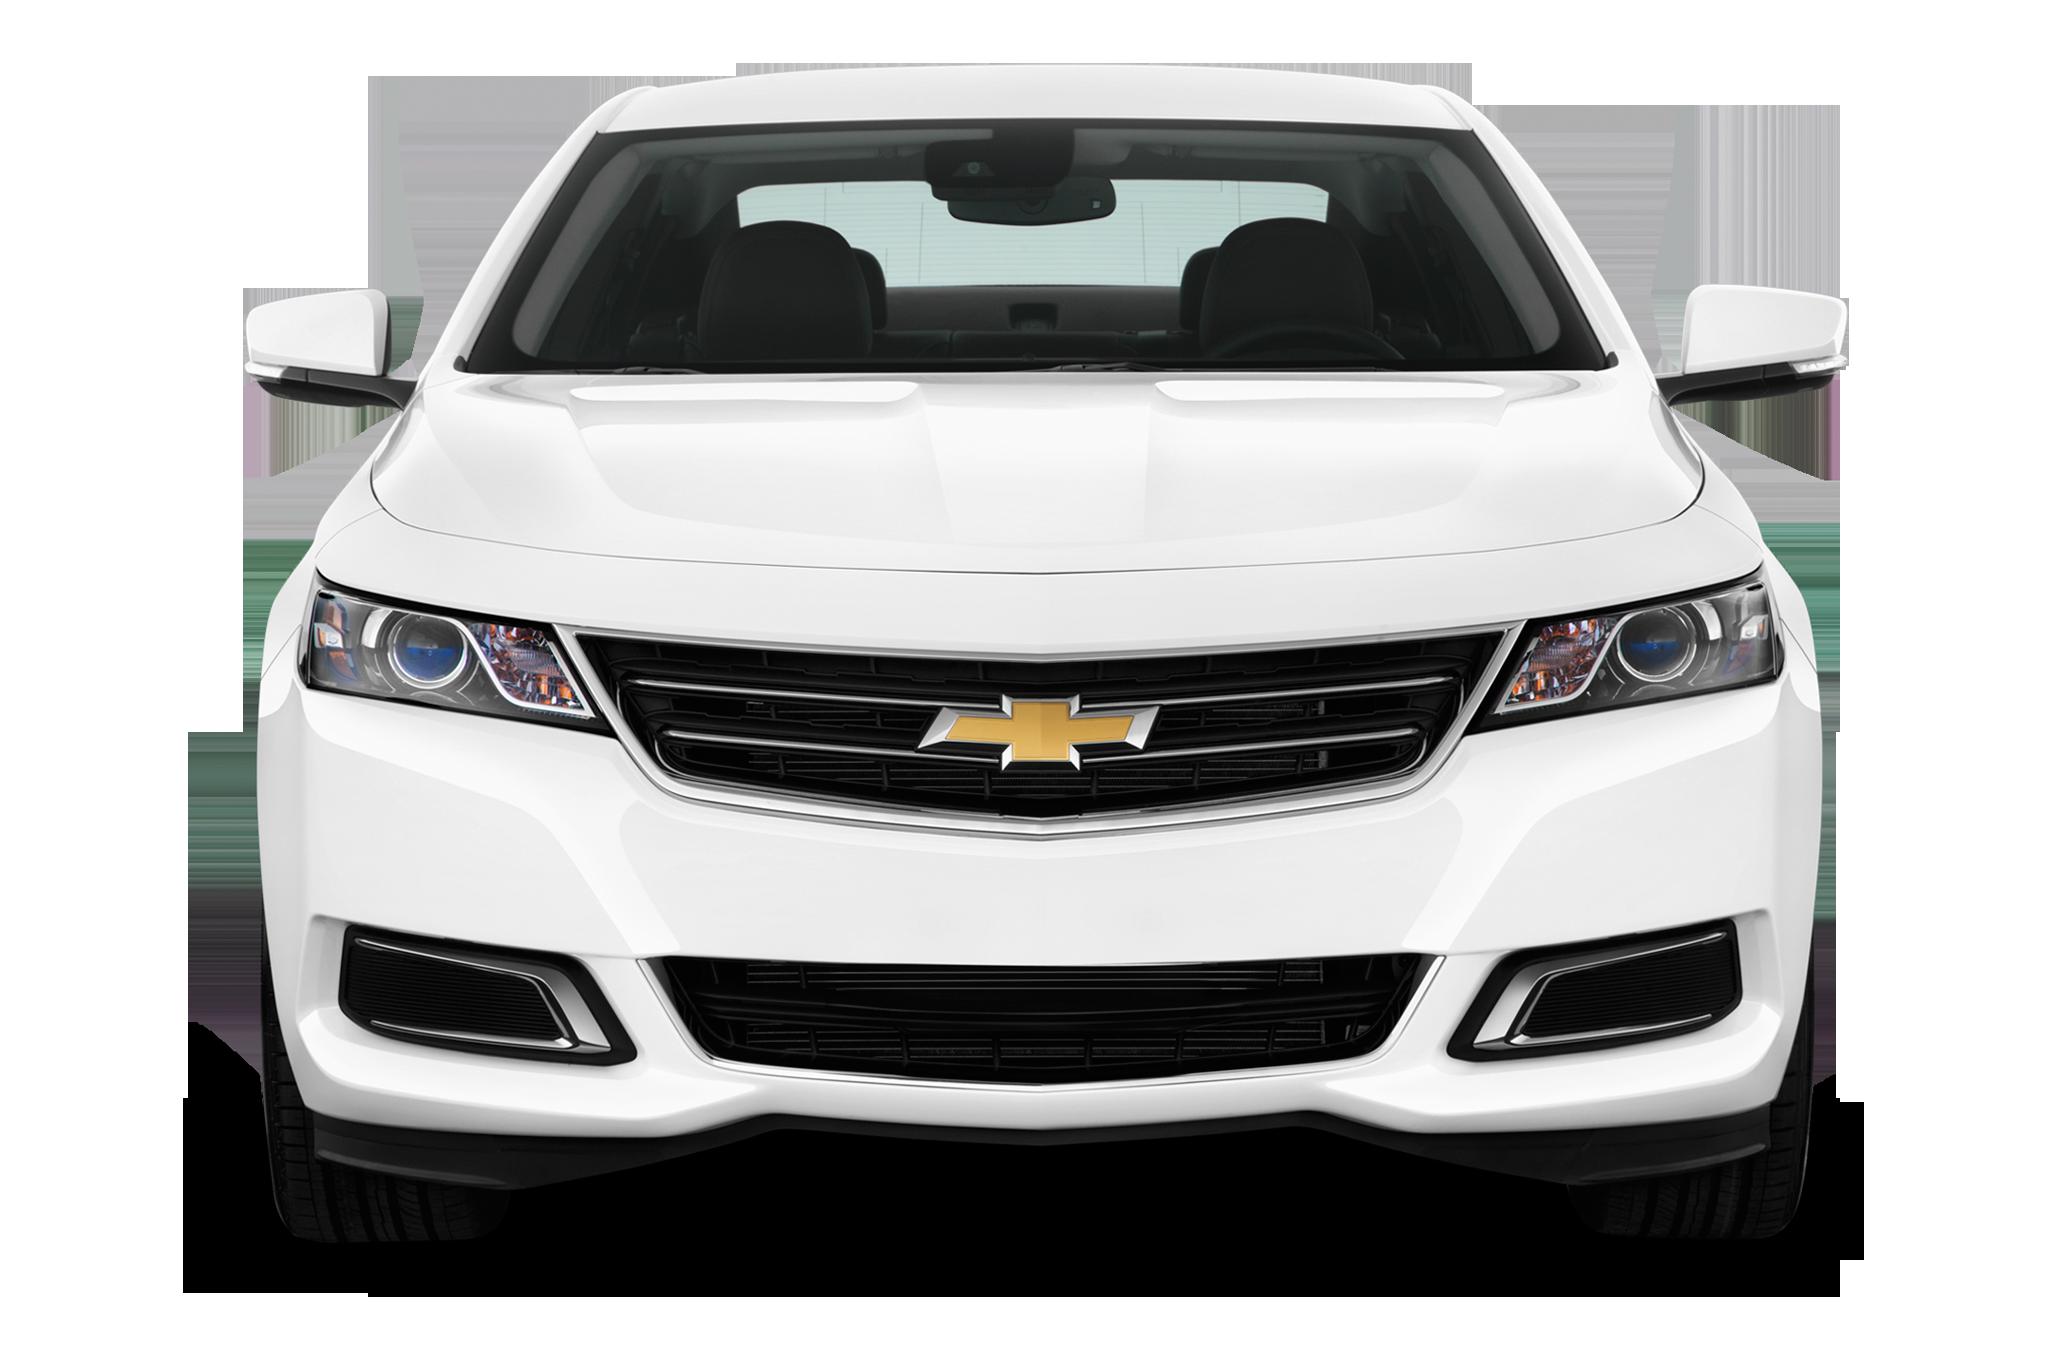 Chevrolet png image purepng. Clipart car impala